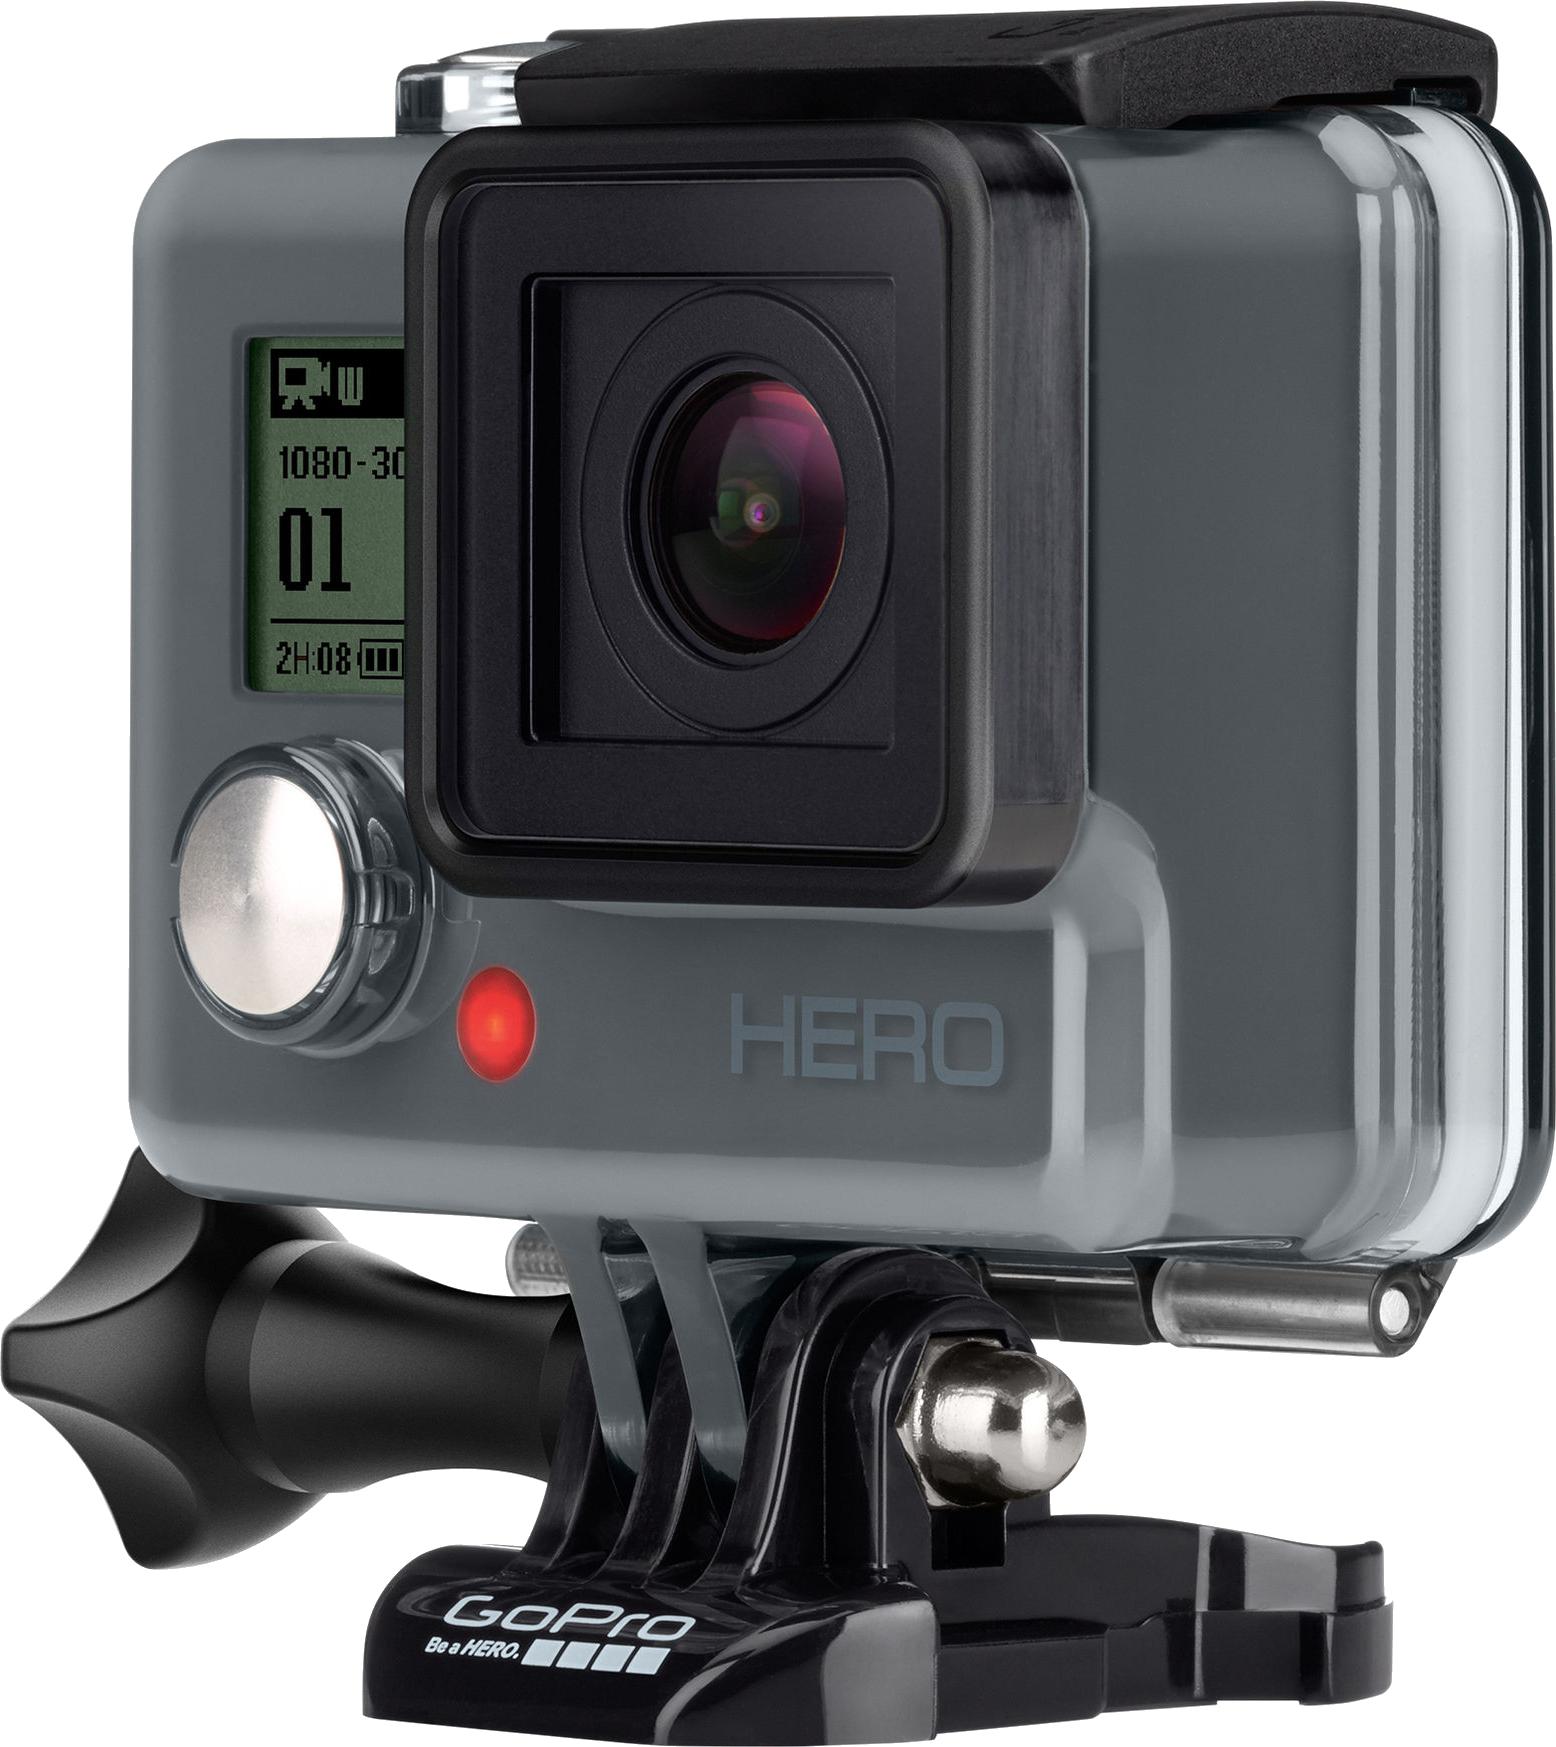 Gopro cameras png images. Lighting clipart lights camera action